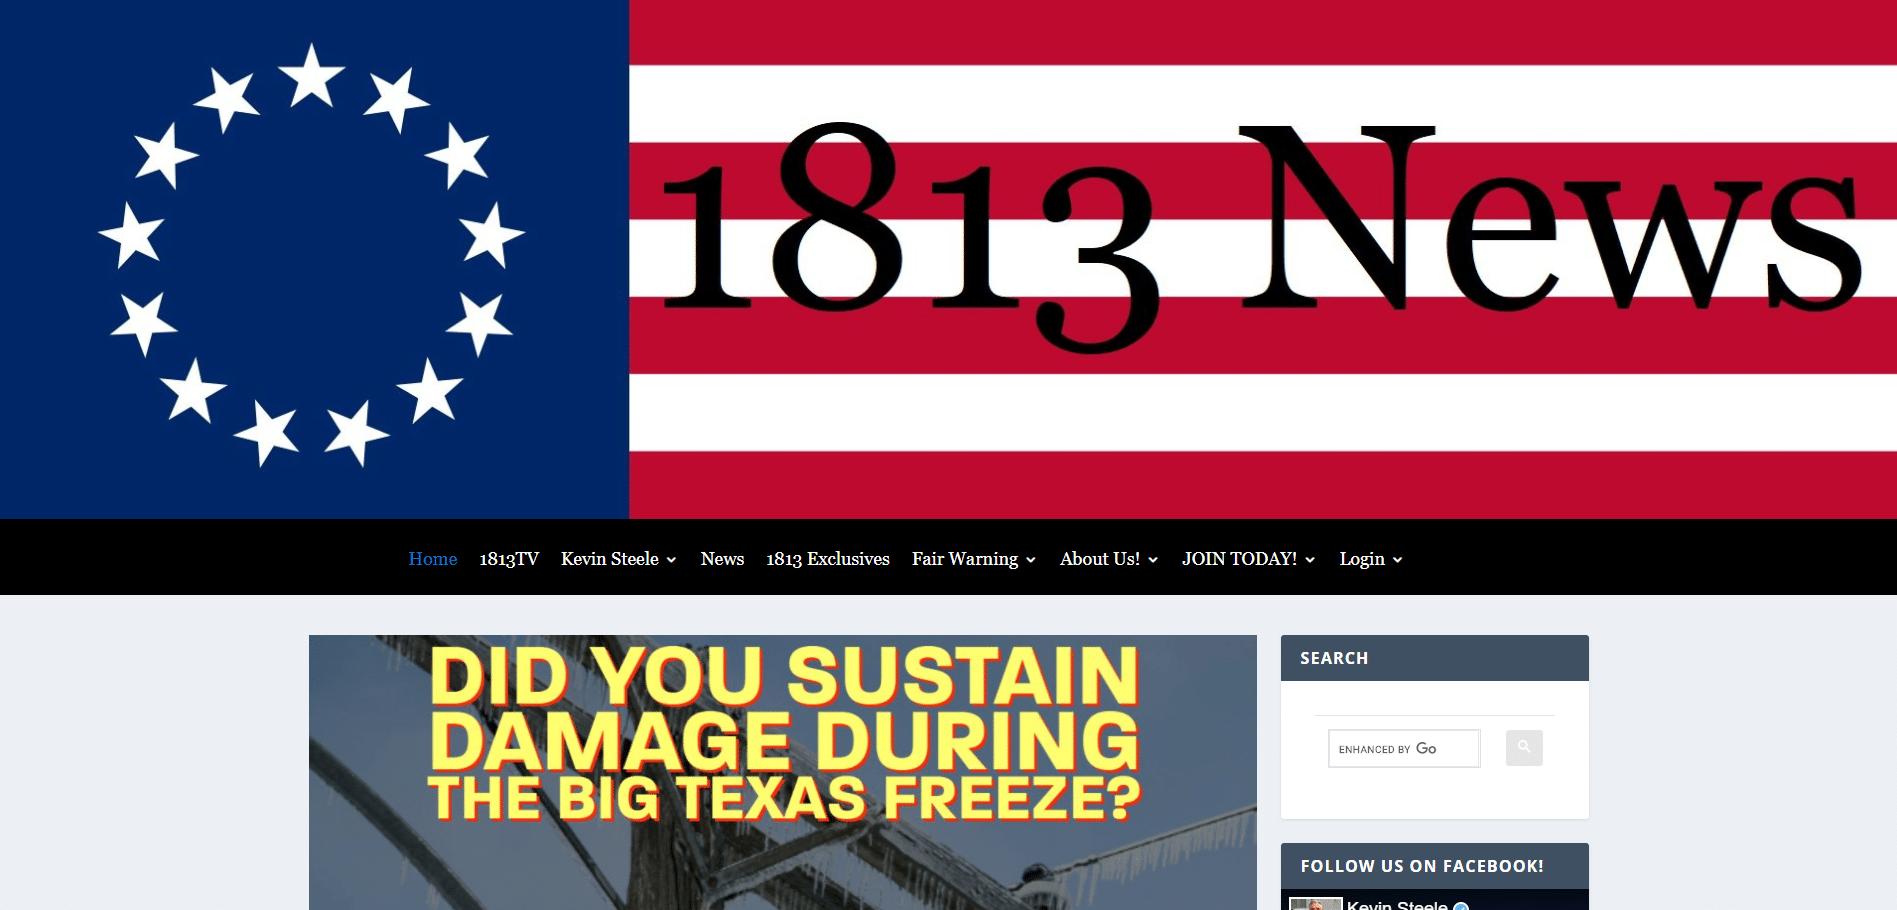 1813news